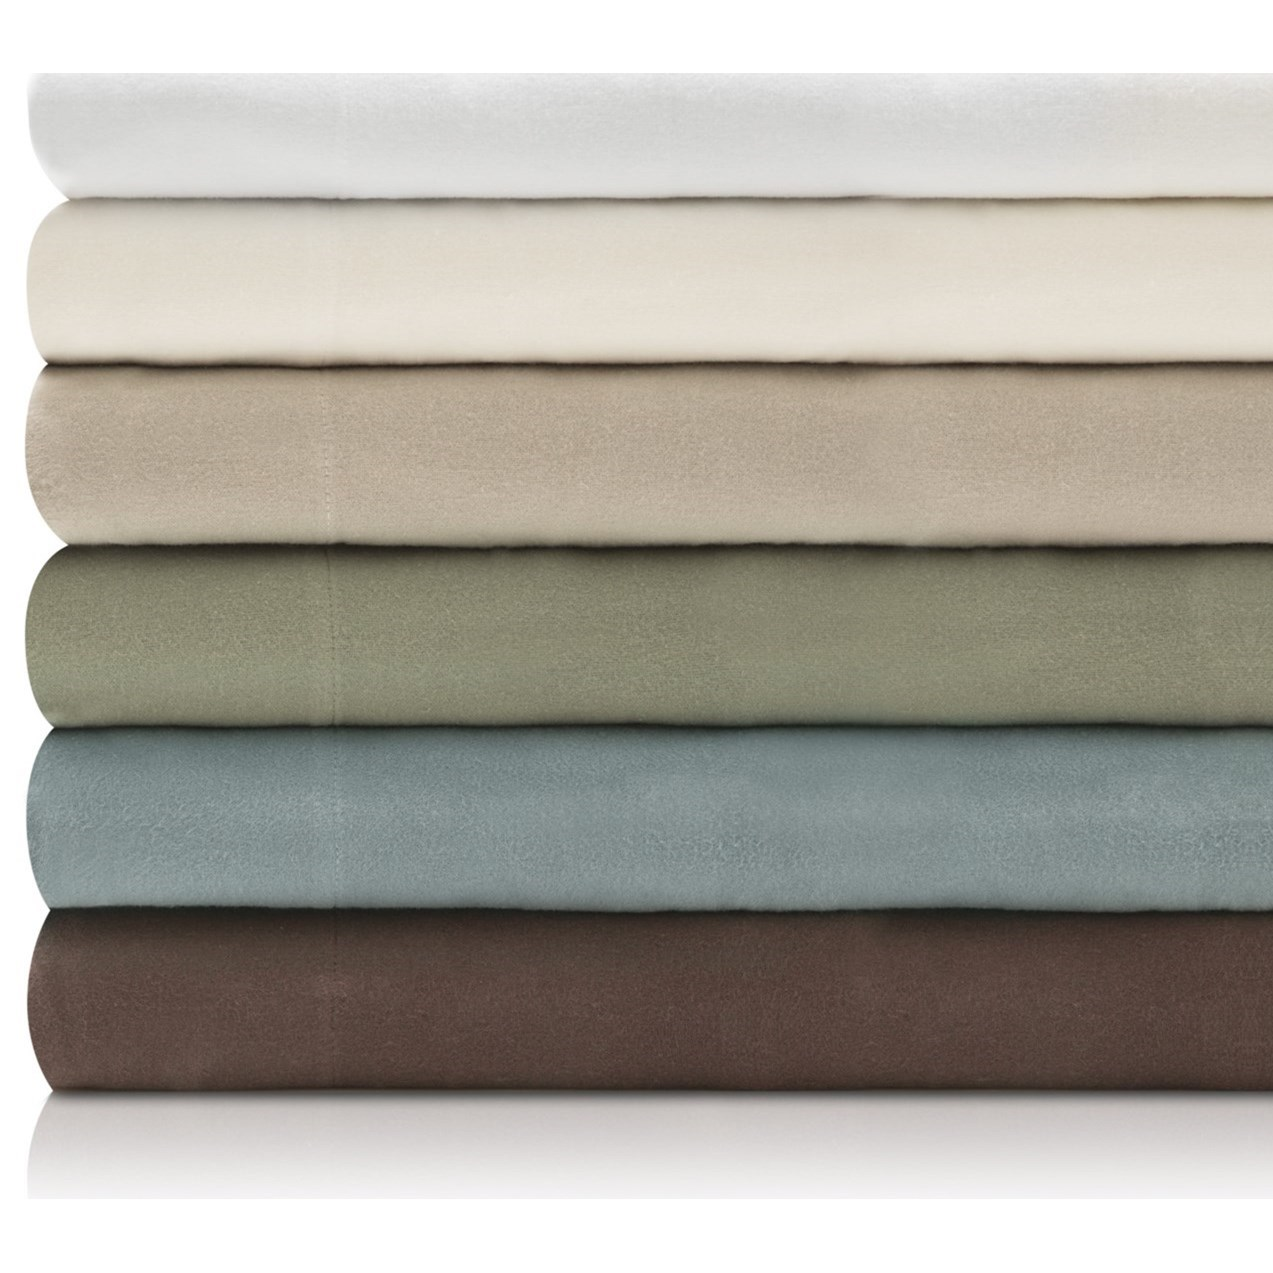 Malouf Portuguese Flannel Split King Woven™ Portuguese Flannel Sheet S - Item Number: WO19SKPNFS